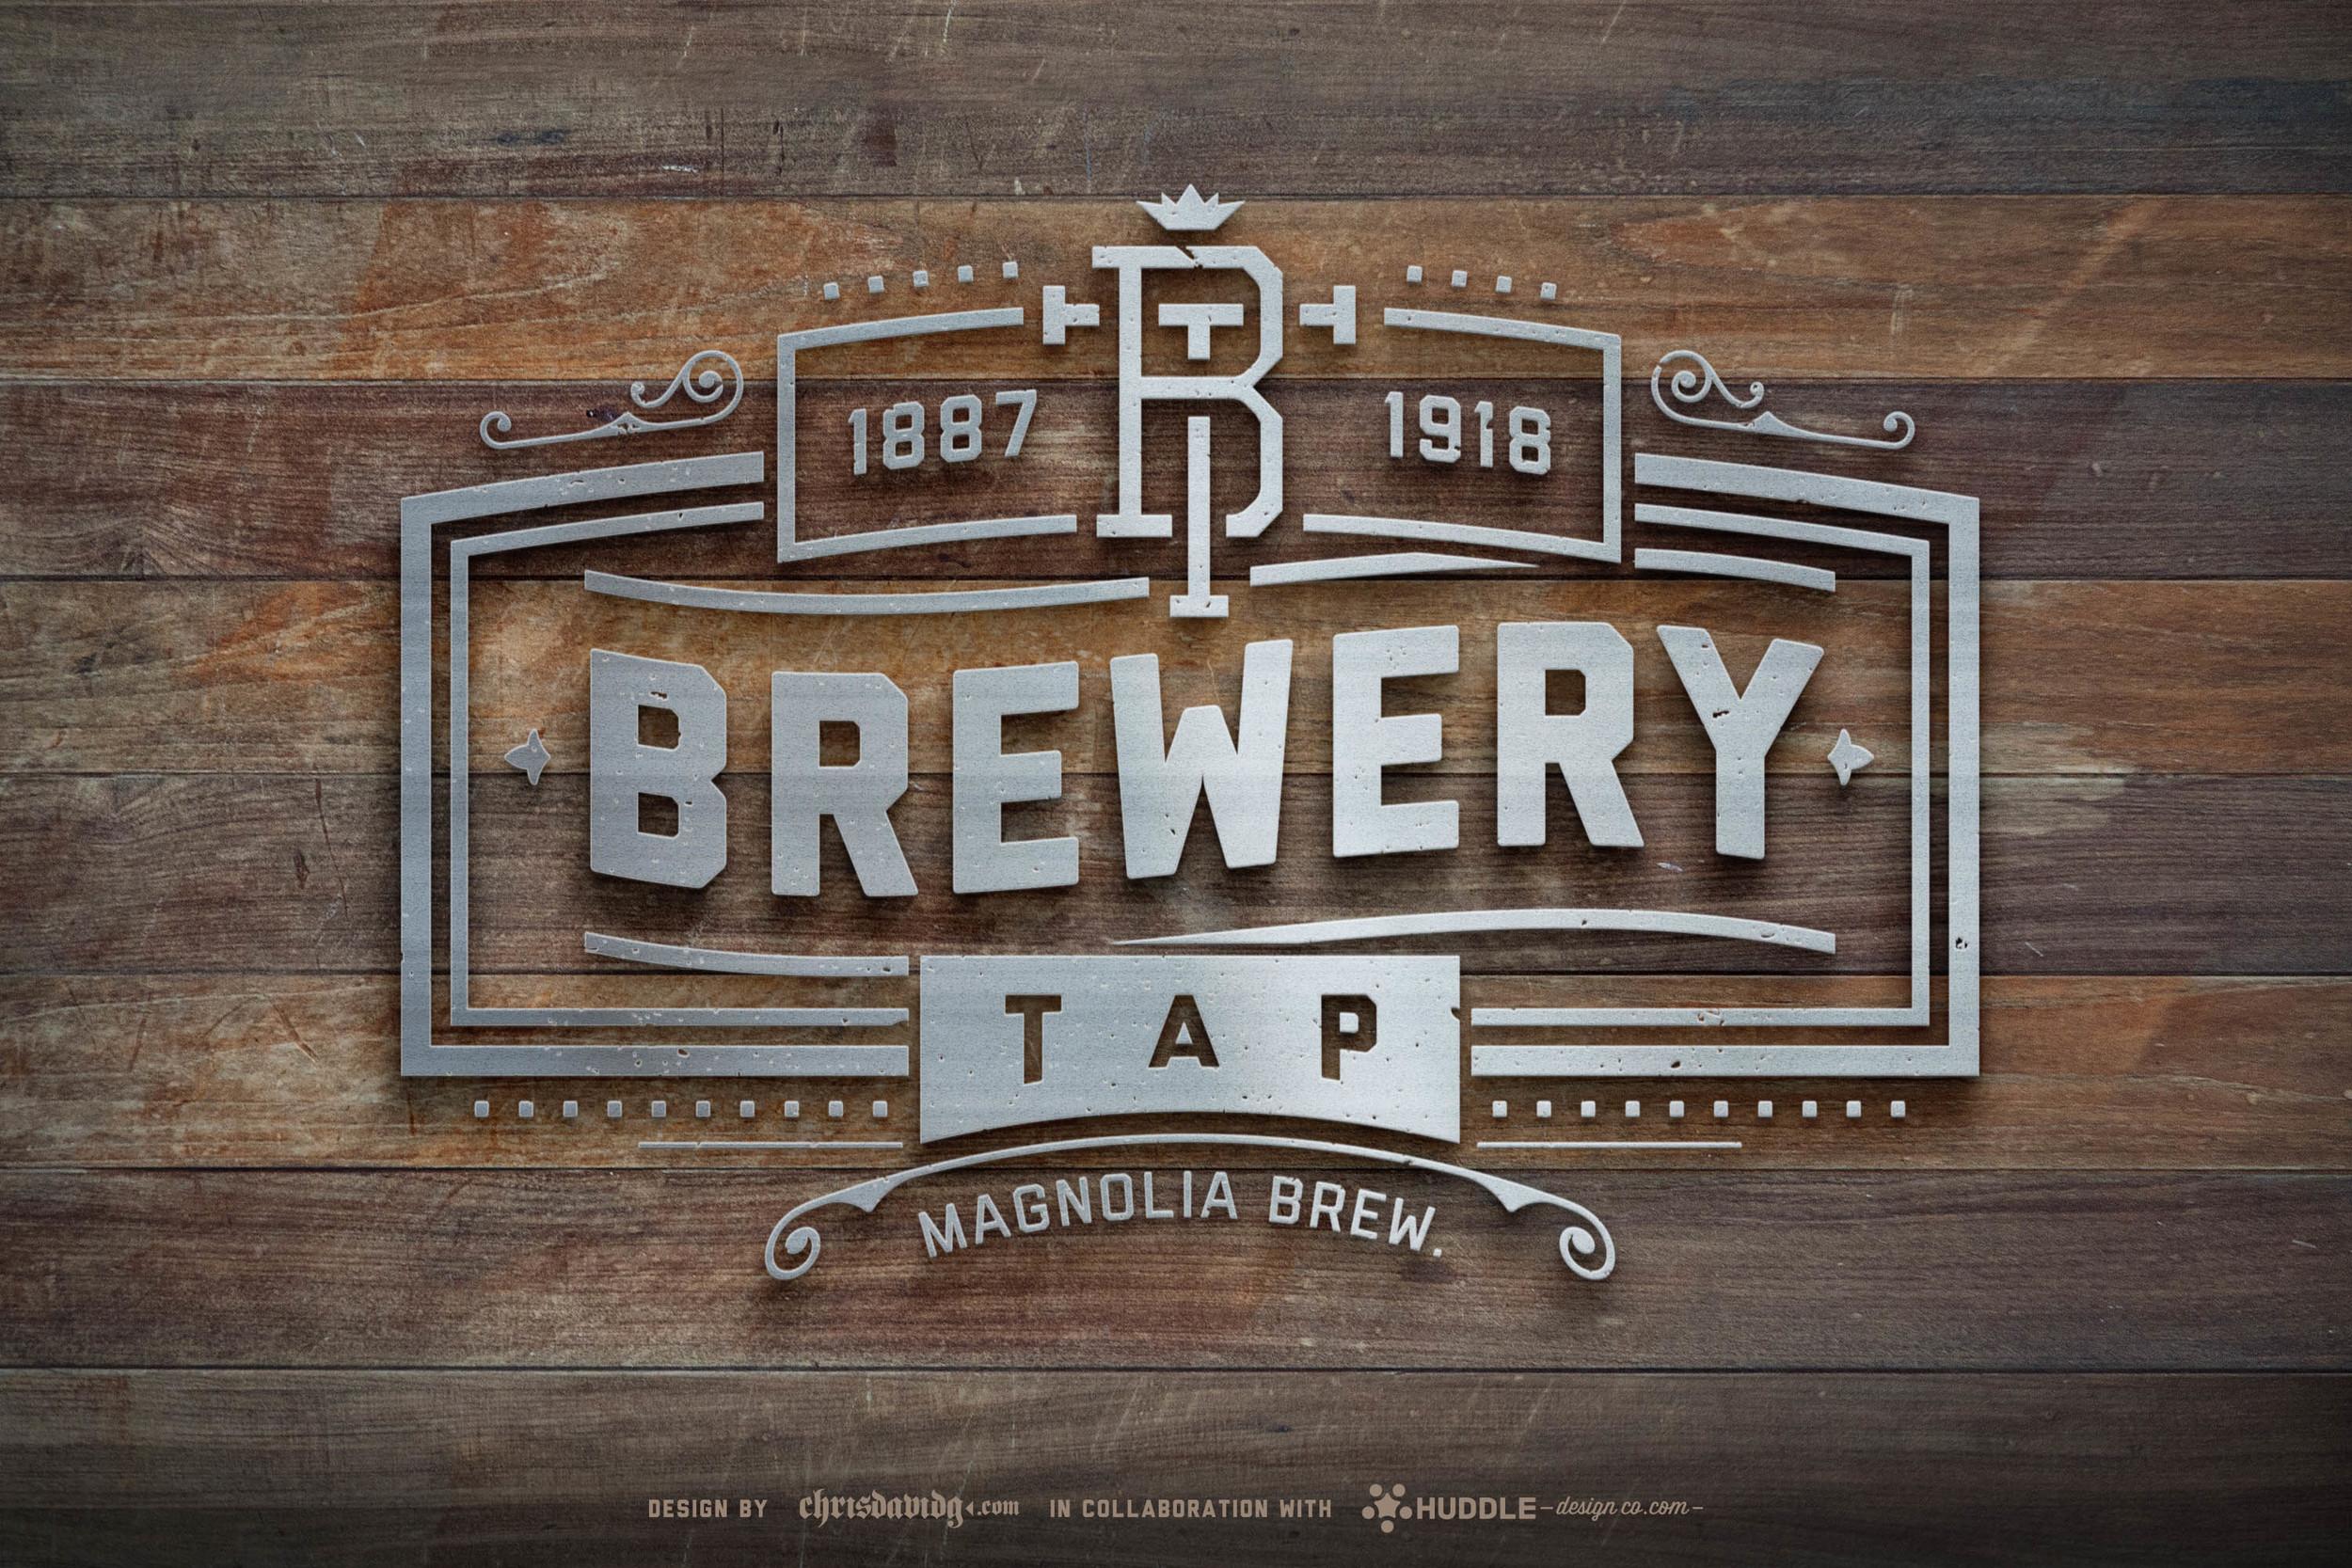 chrisdavidg-brewerytap-logo-1-proof3.jpg